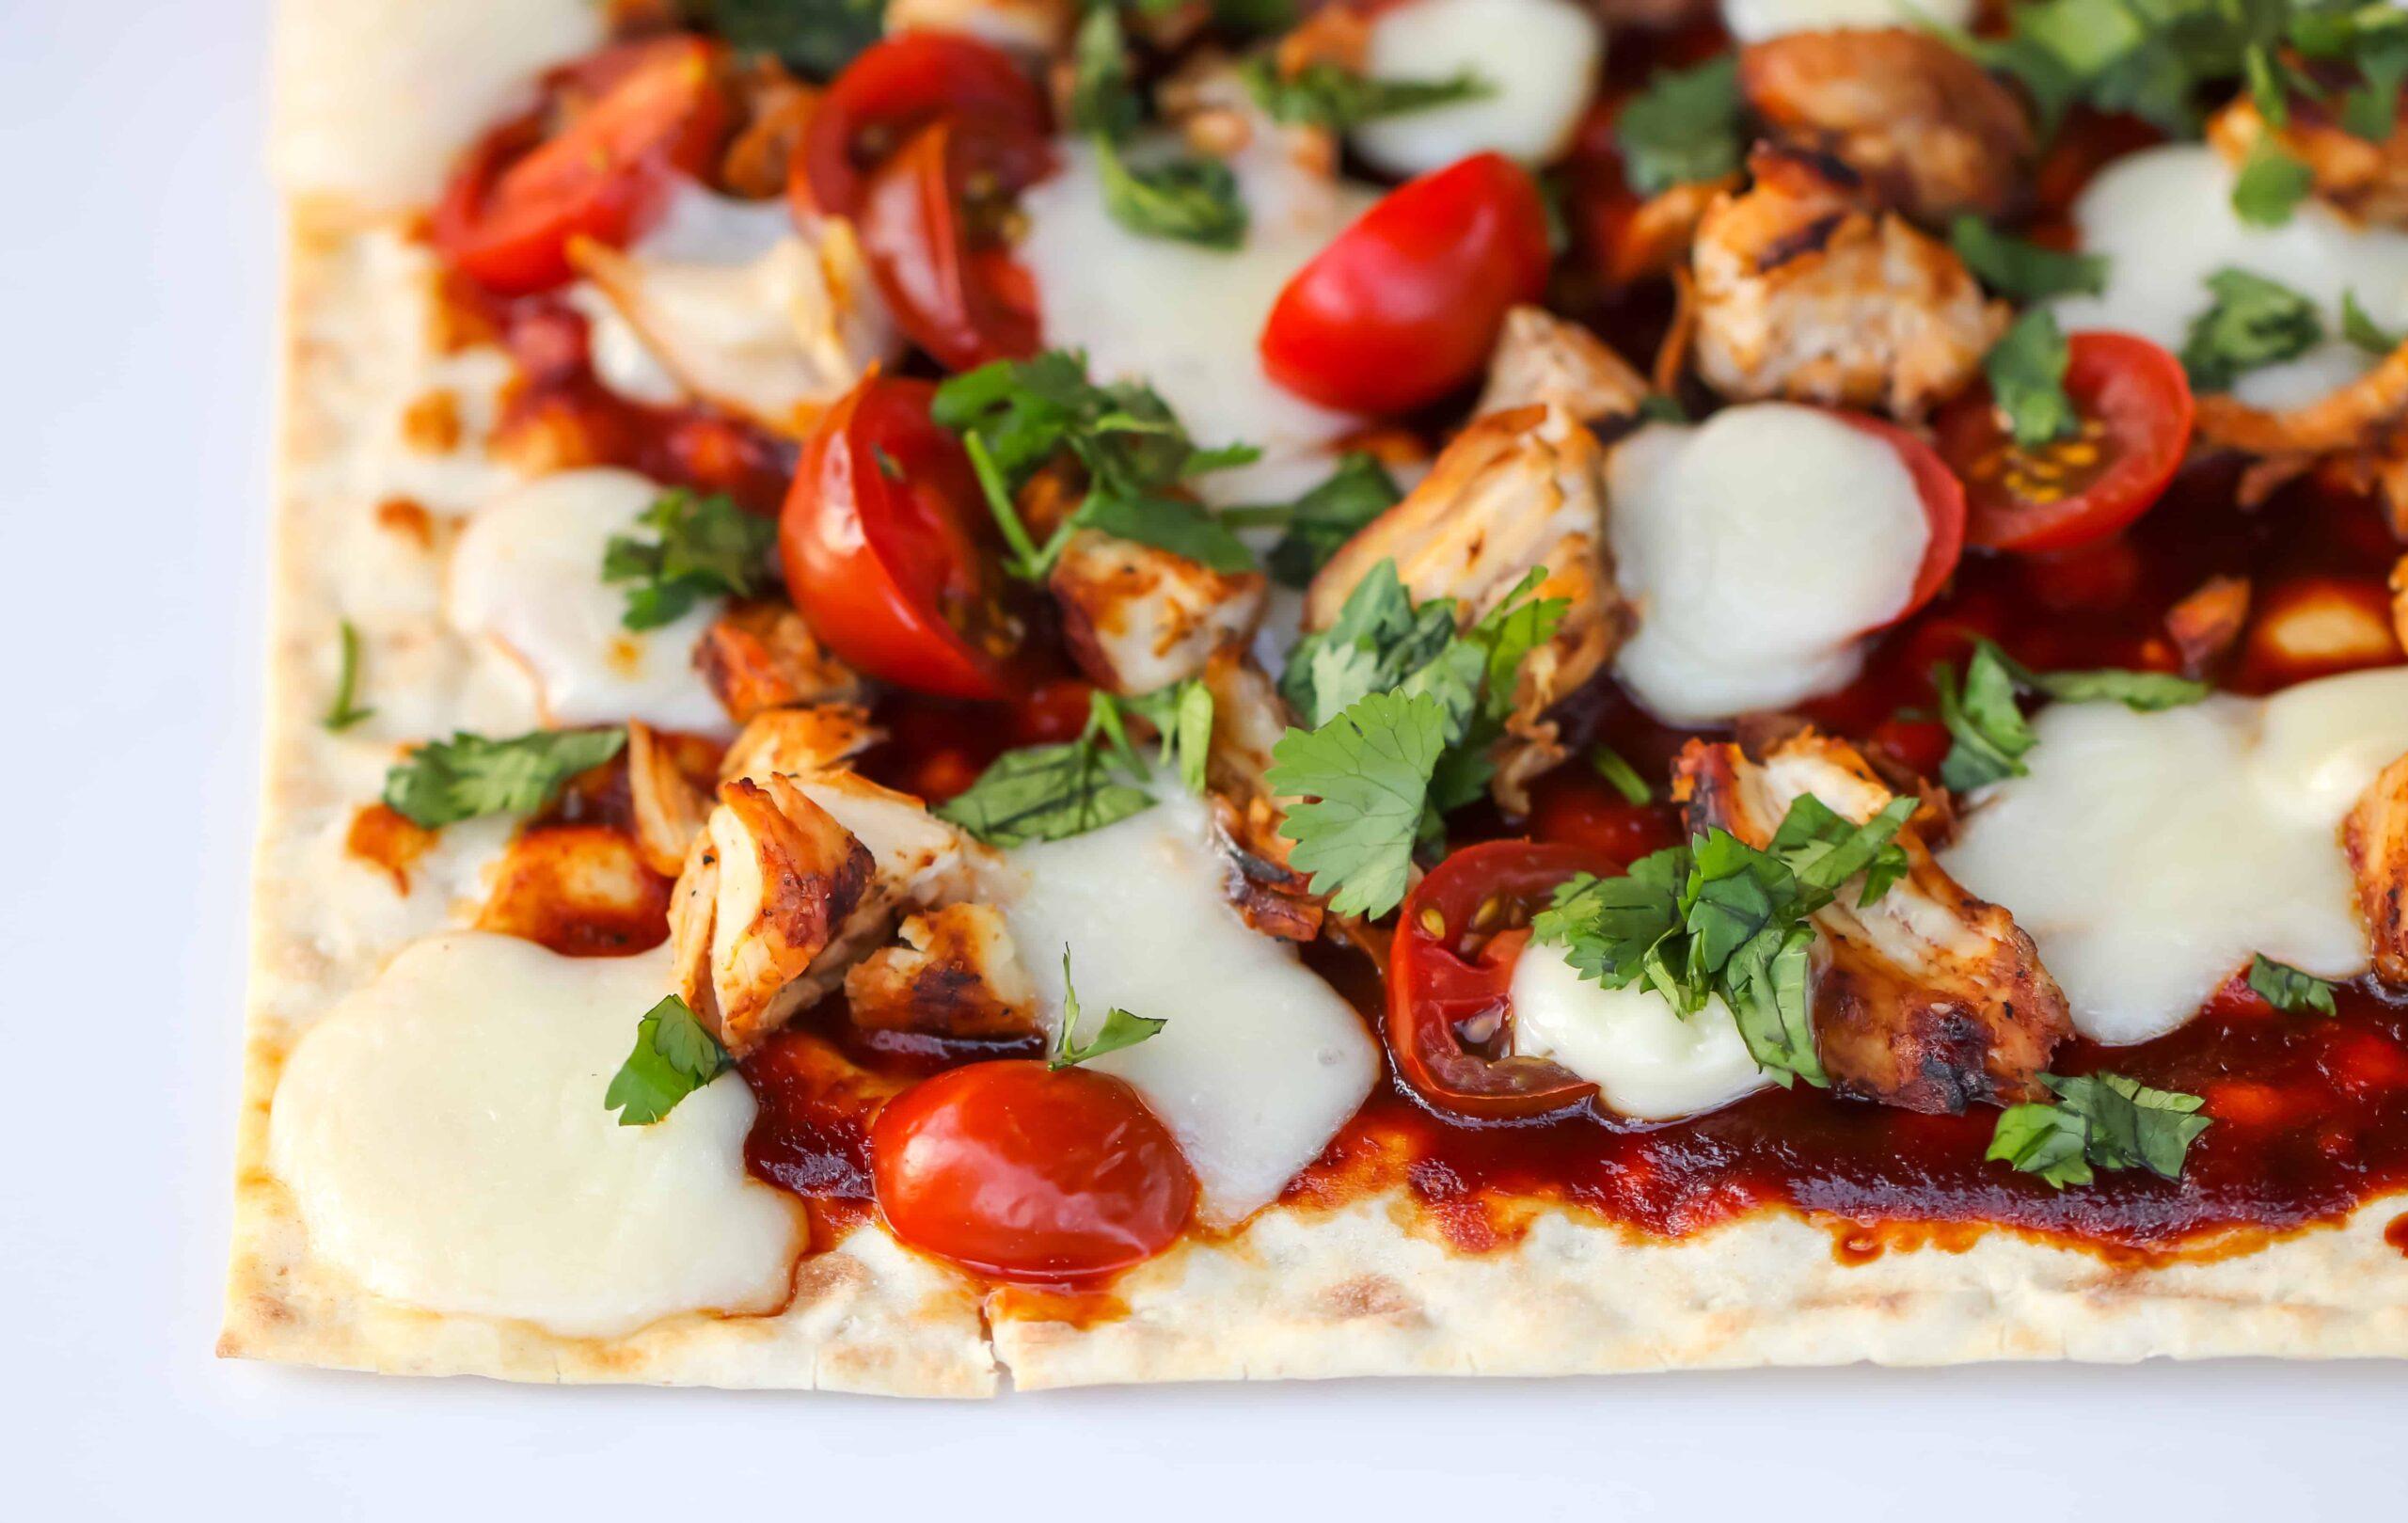 Fridge Friendly Pizzas using California Lavash @shawsimpleswaps #pizza #californialavash